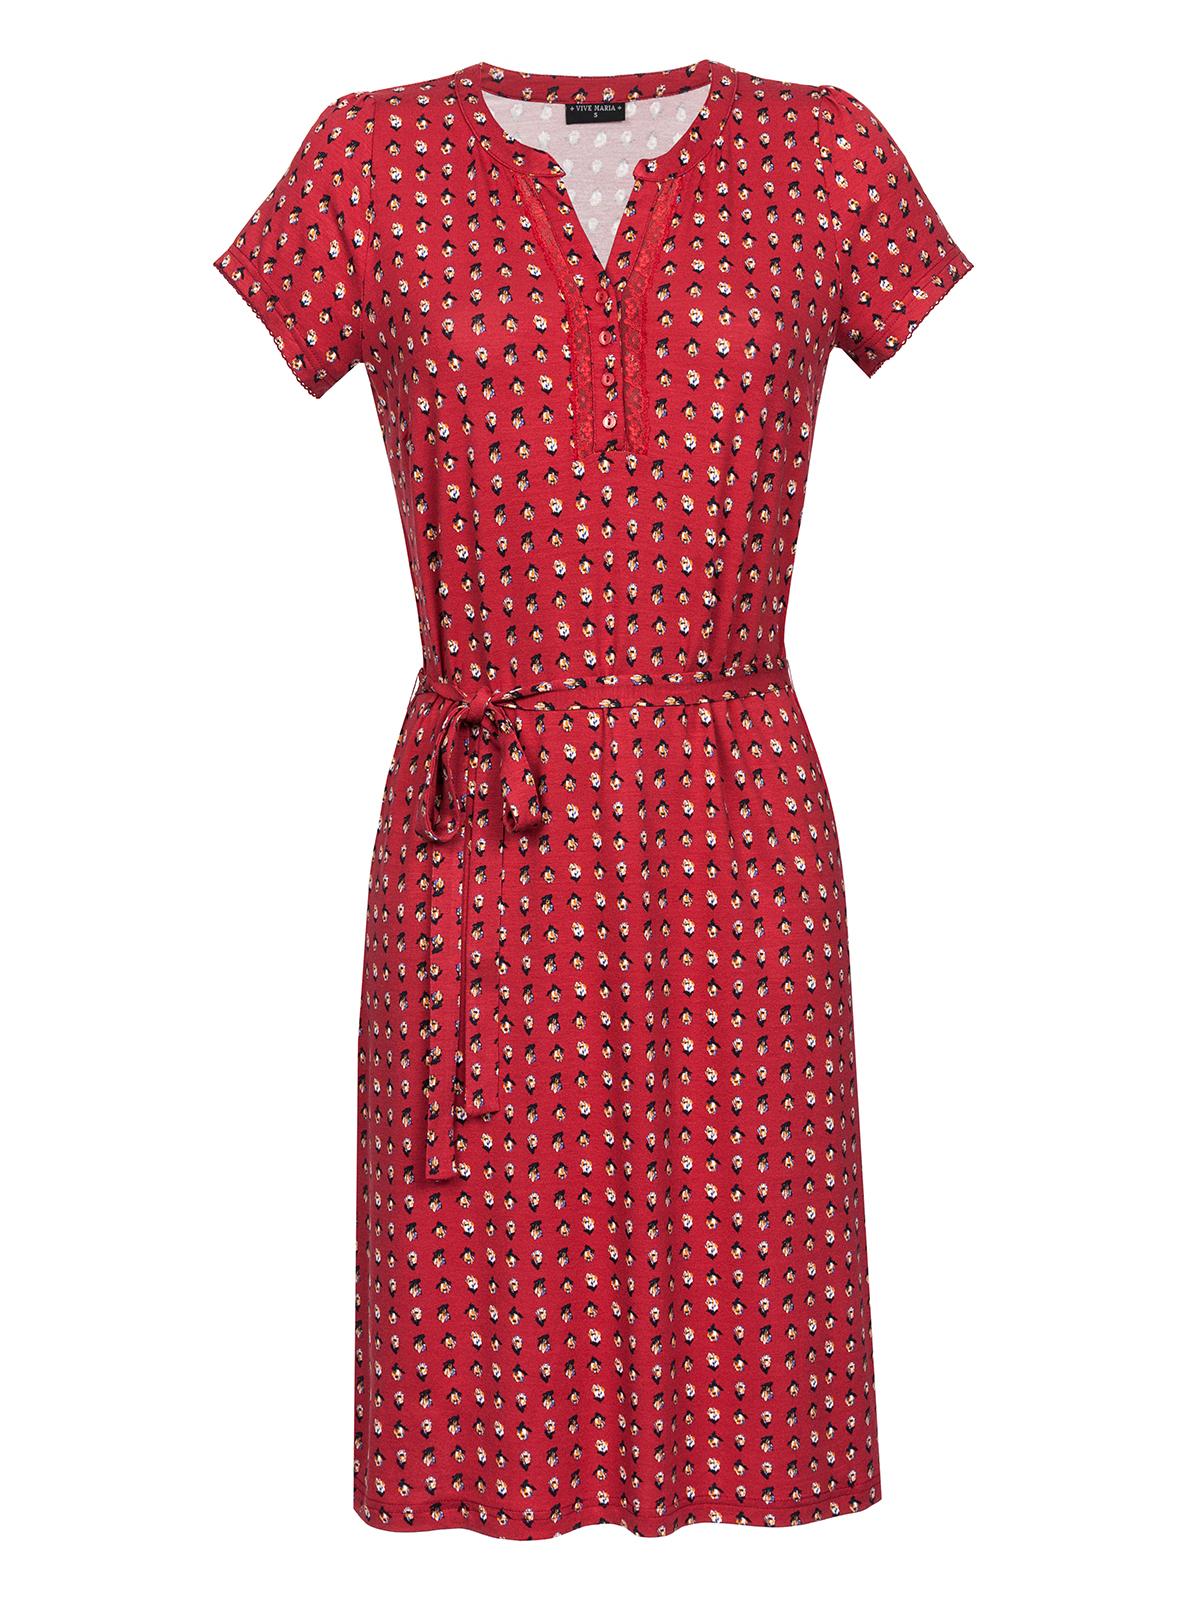 Vive Maria Fleur Rouge Dress Kleid rot Allover-...